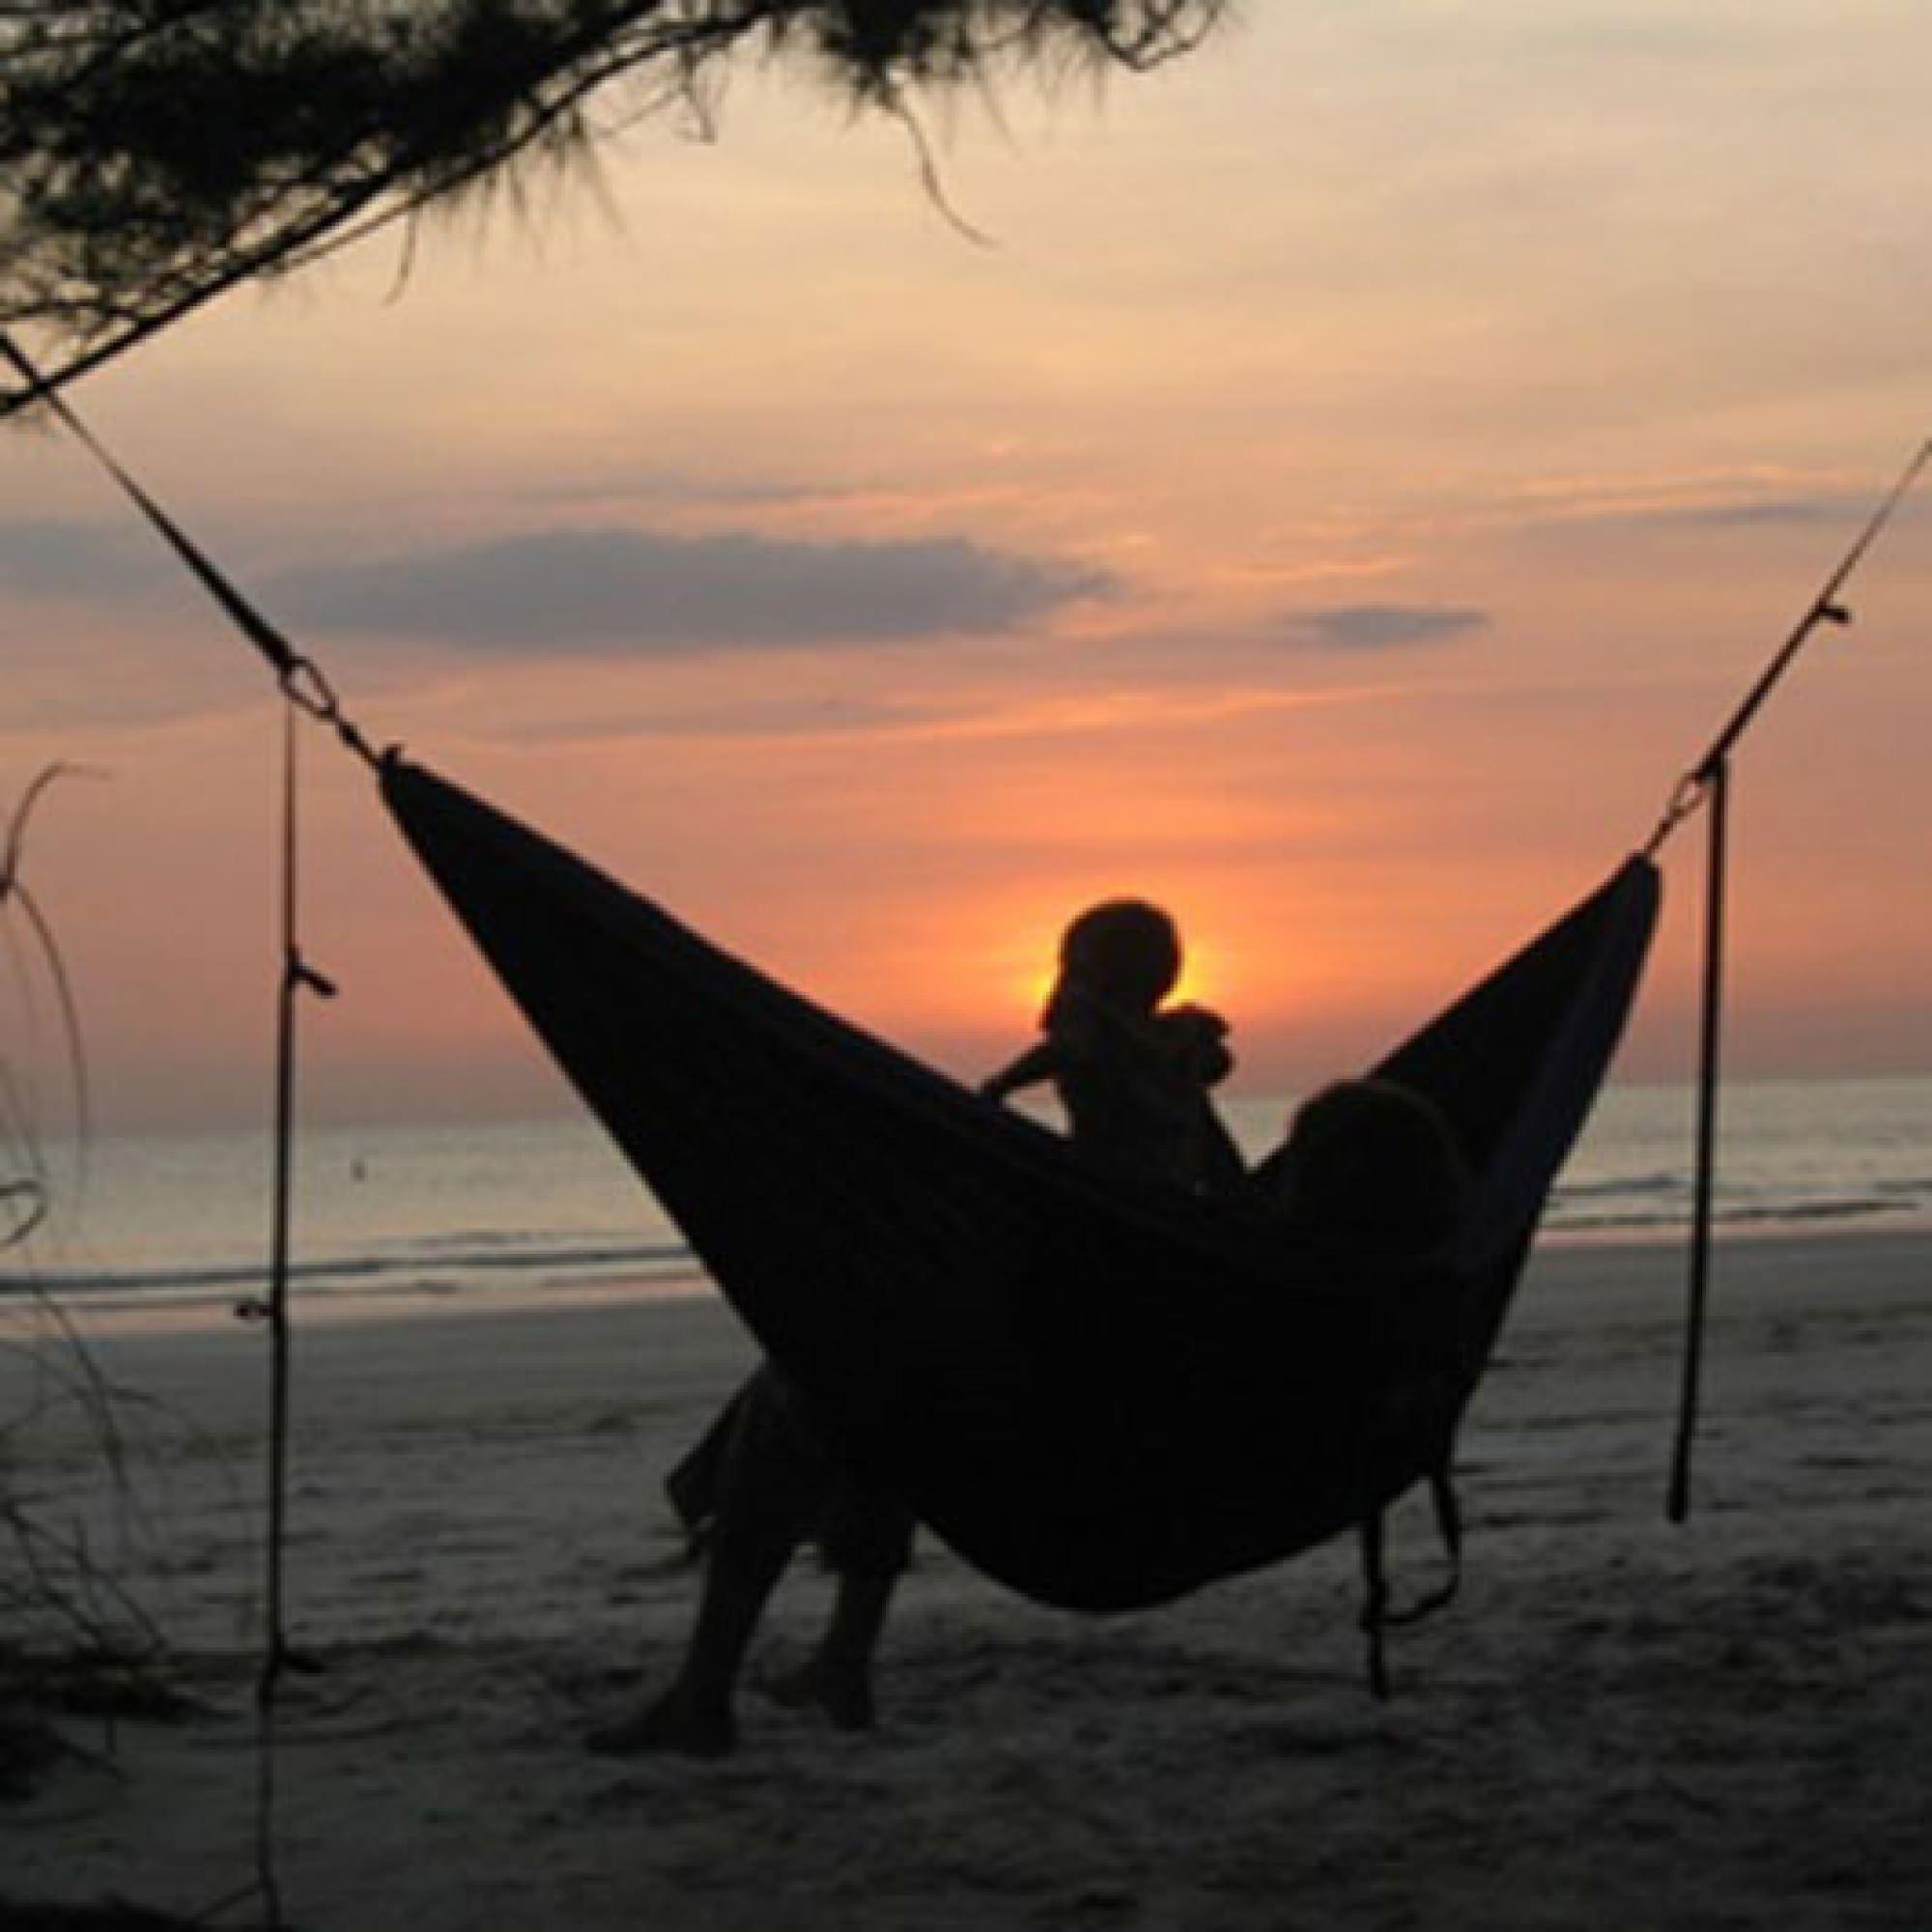 duracord expert reviews hammock xx the guide sale hammocks oatmeal eno singlenest rope best large